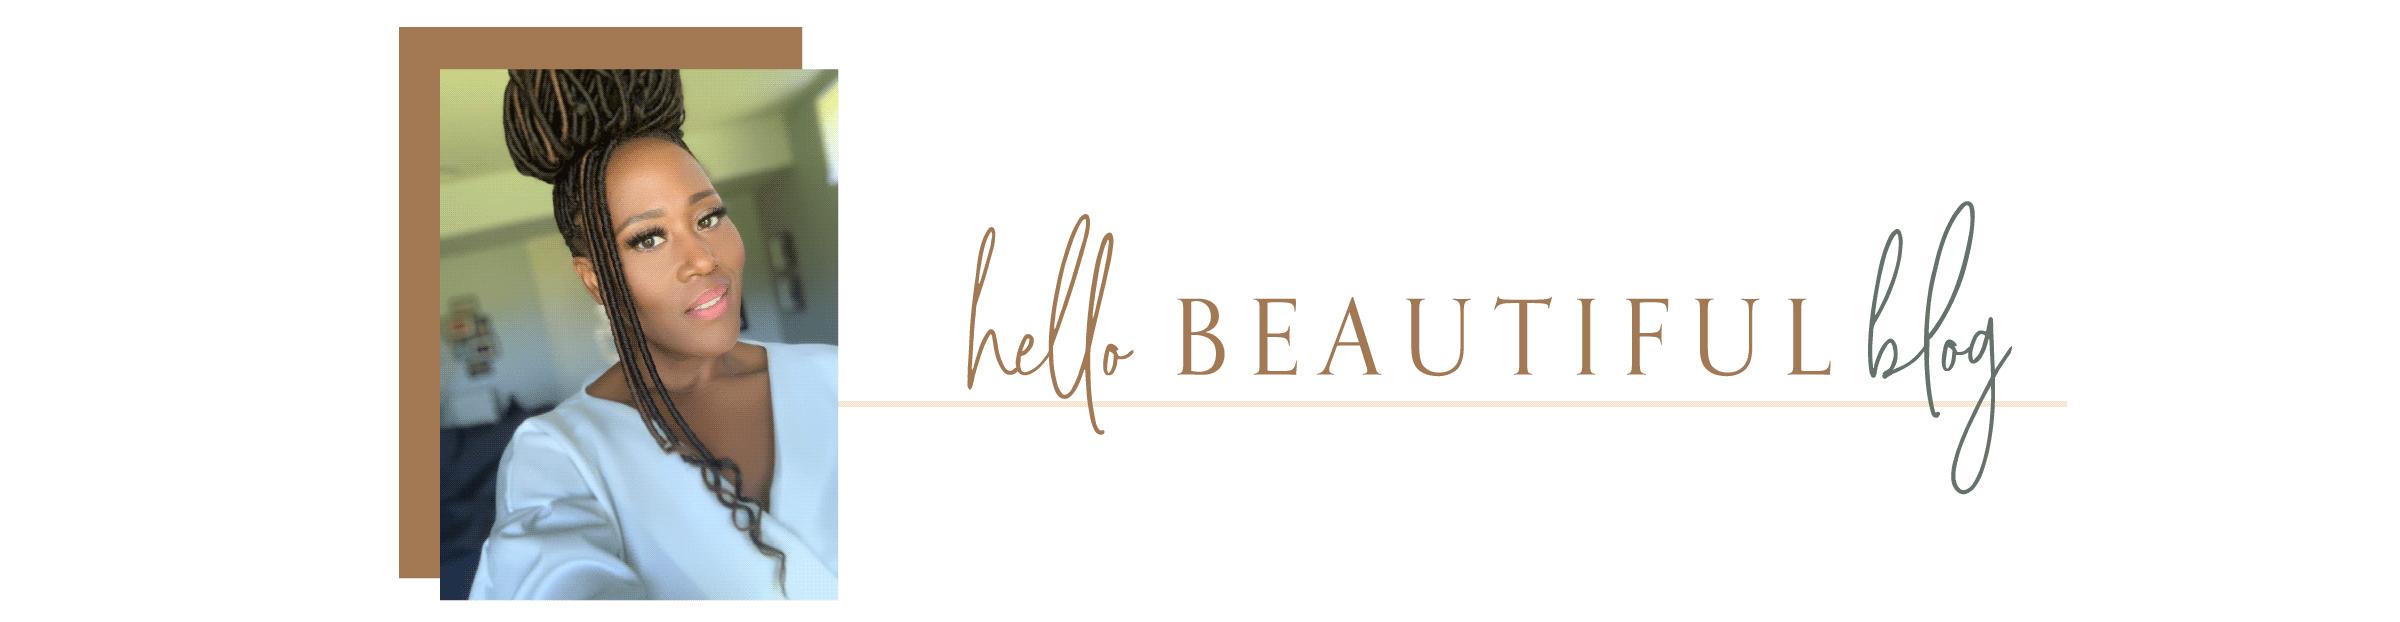 hello-beautiful-blog.png